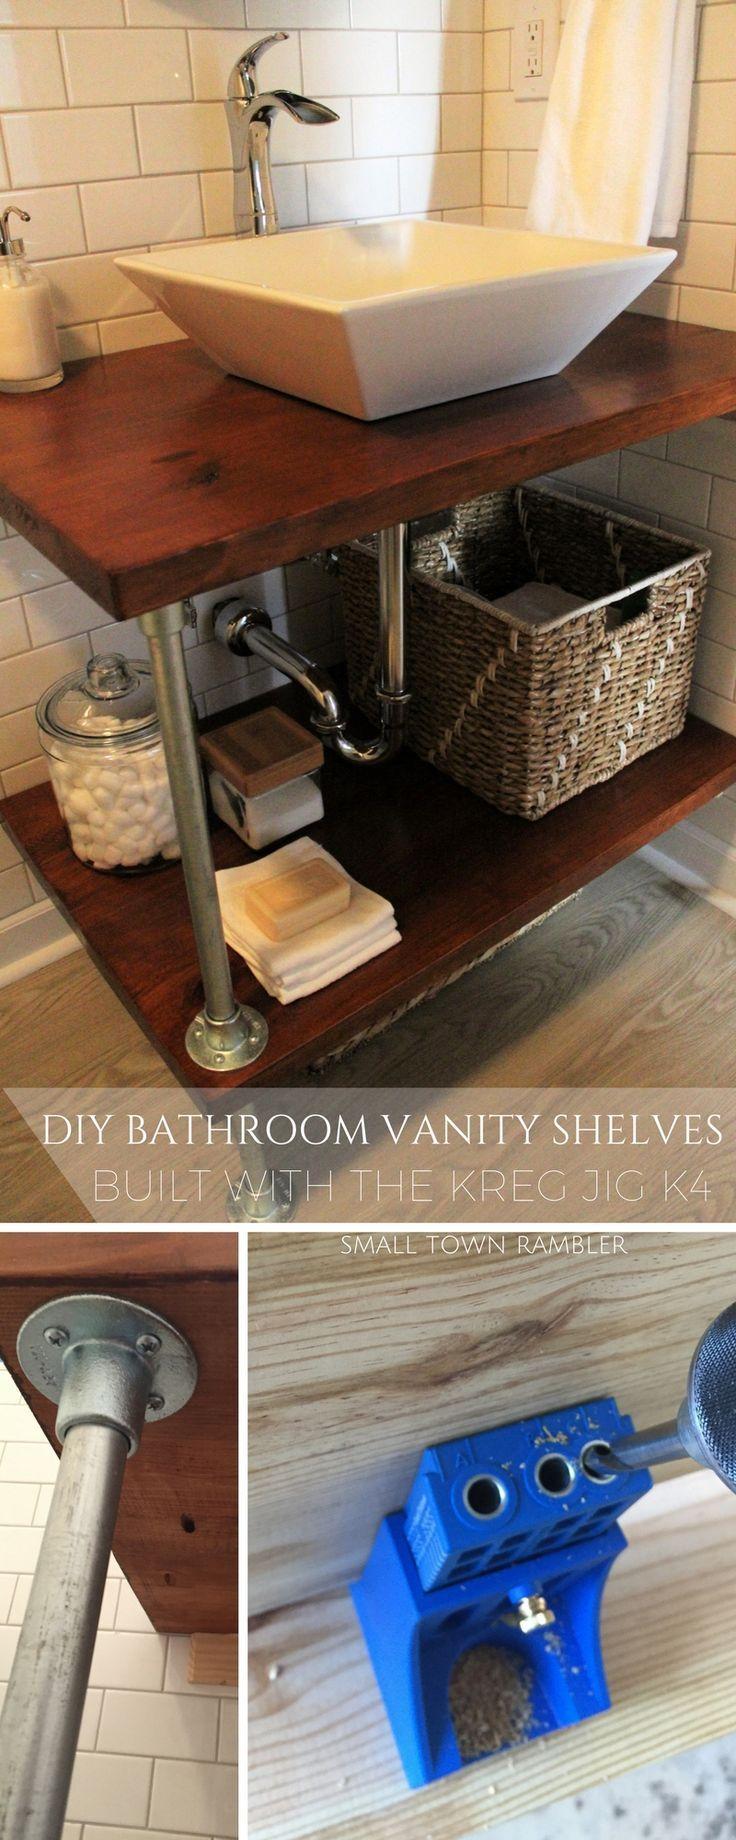 DIY Open Bathroom Vanity Shelves Built with the Kreg Jig K4. /kregtool/